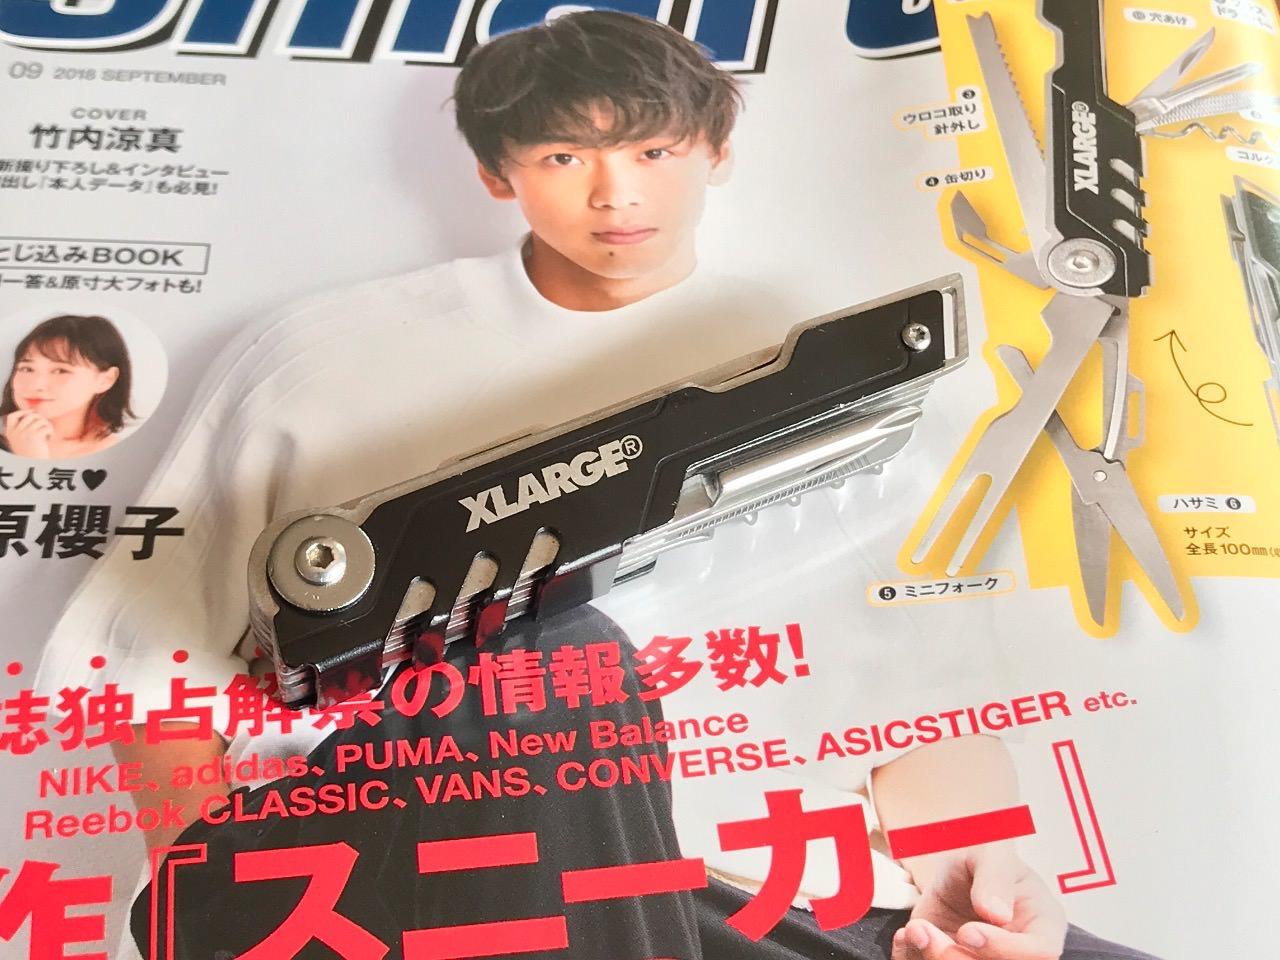 XLARGE特製の万能10徳マルチツールが付録の雑誌780円を購入